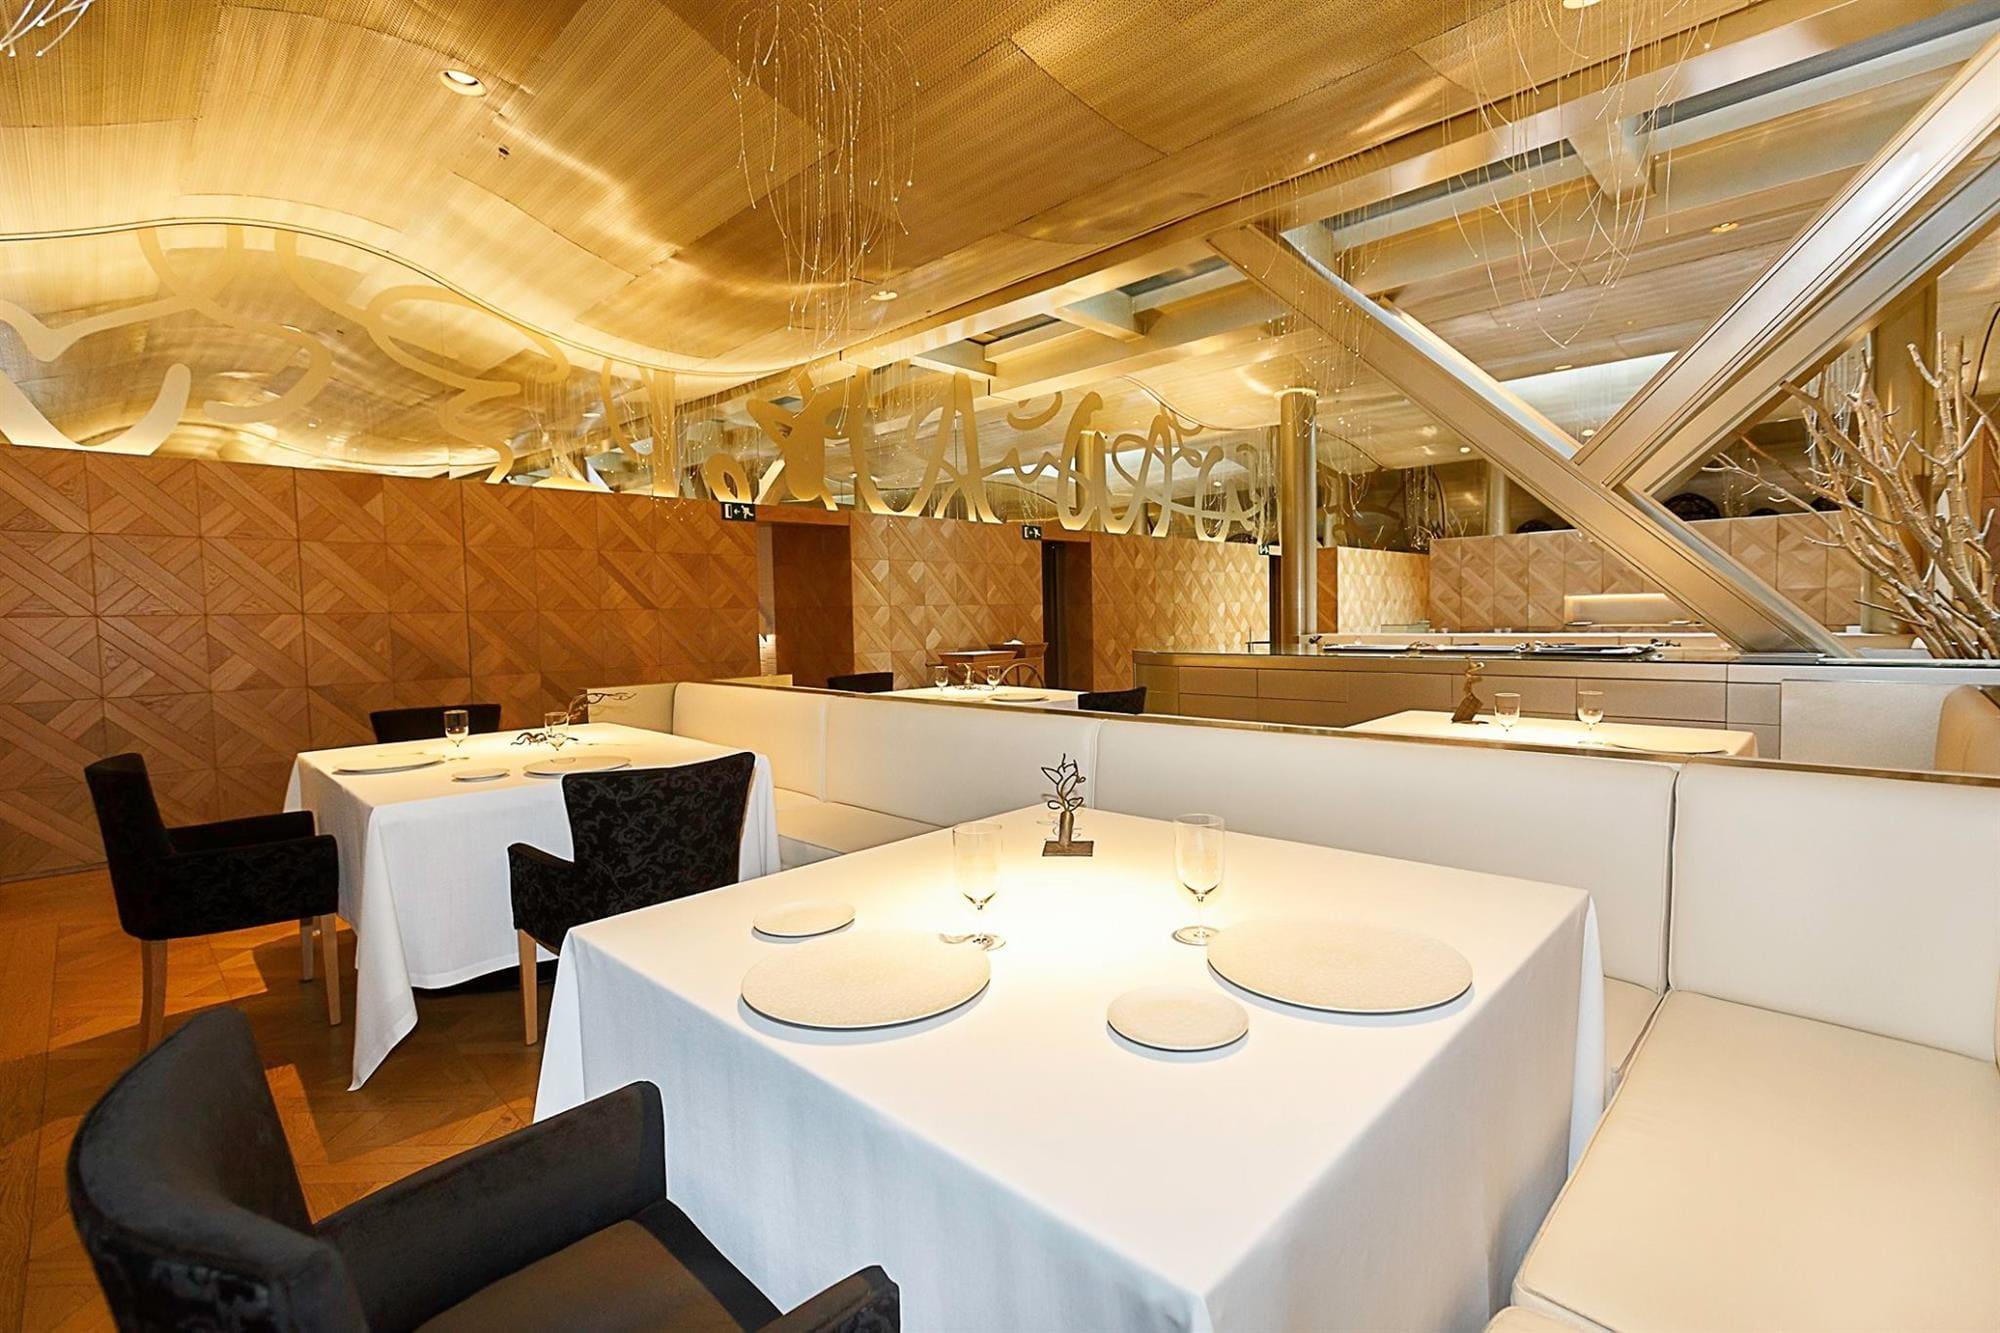 TOP Restaurantes con estrella michelin en Barcelona